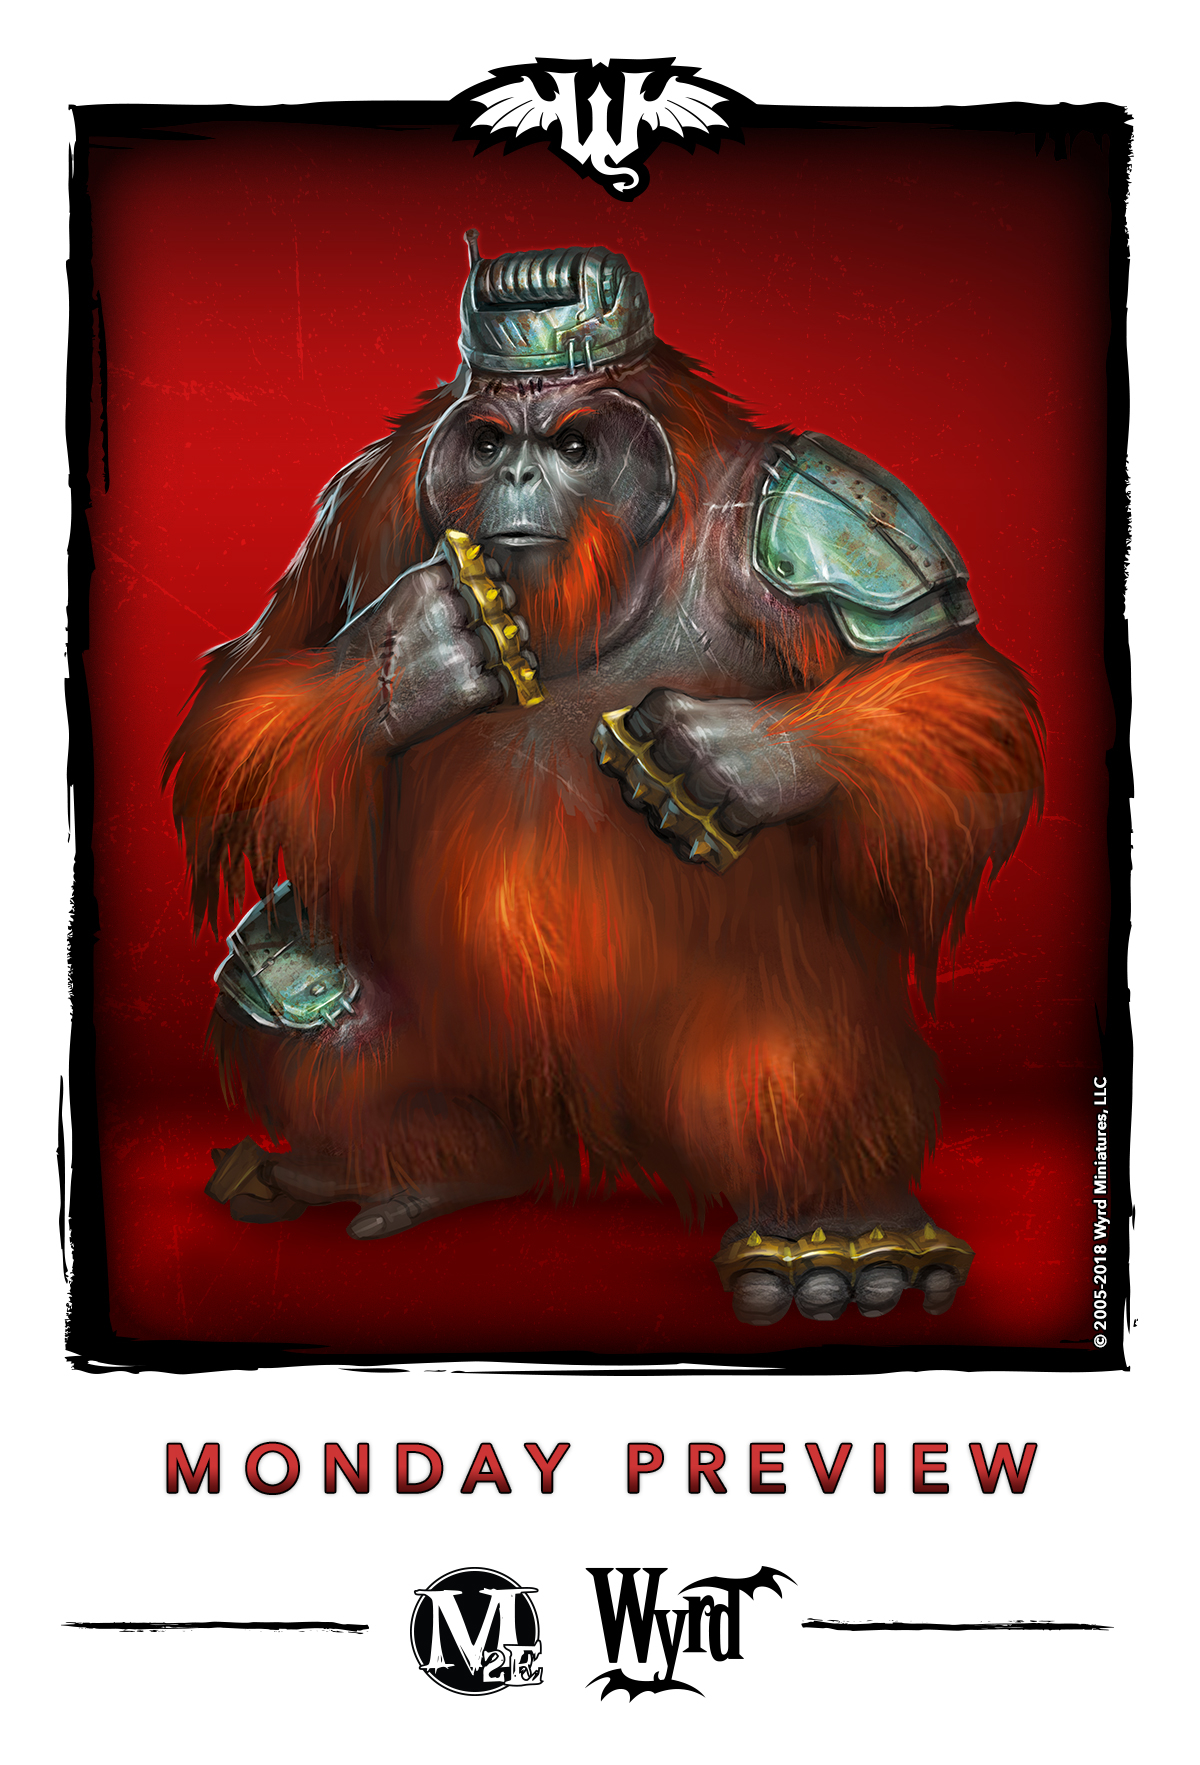 Mystery Monkey Mischief - Malifaux Discussion - Wyrd Forums